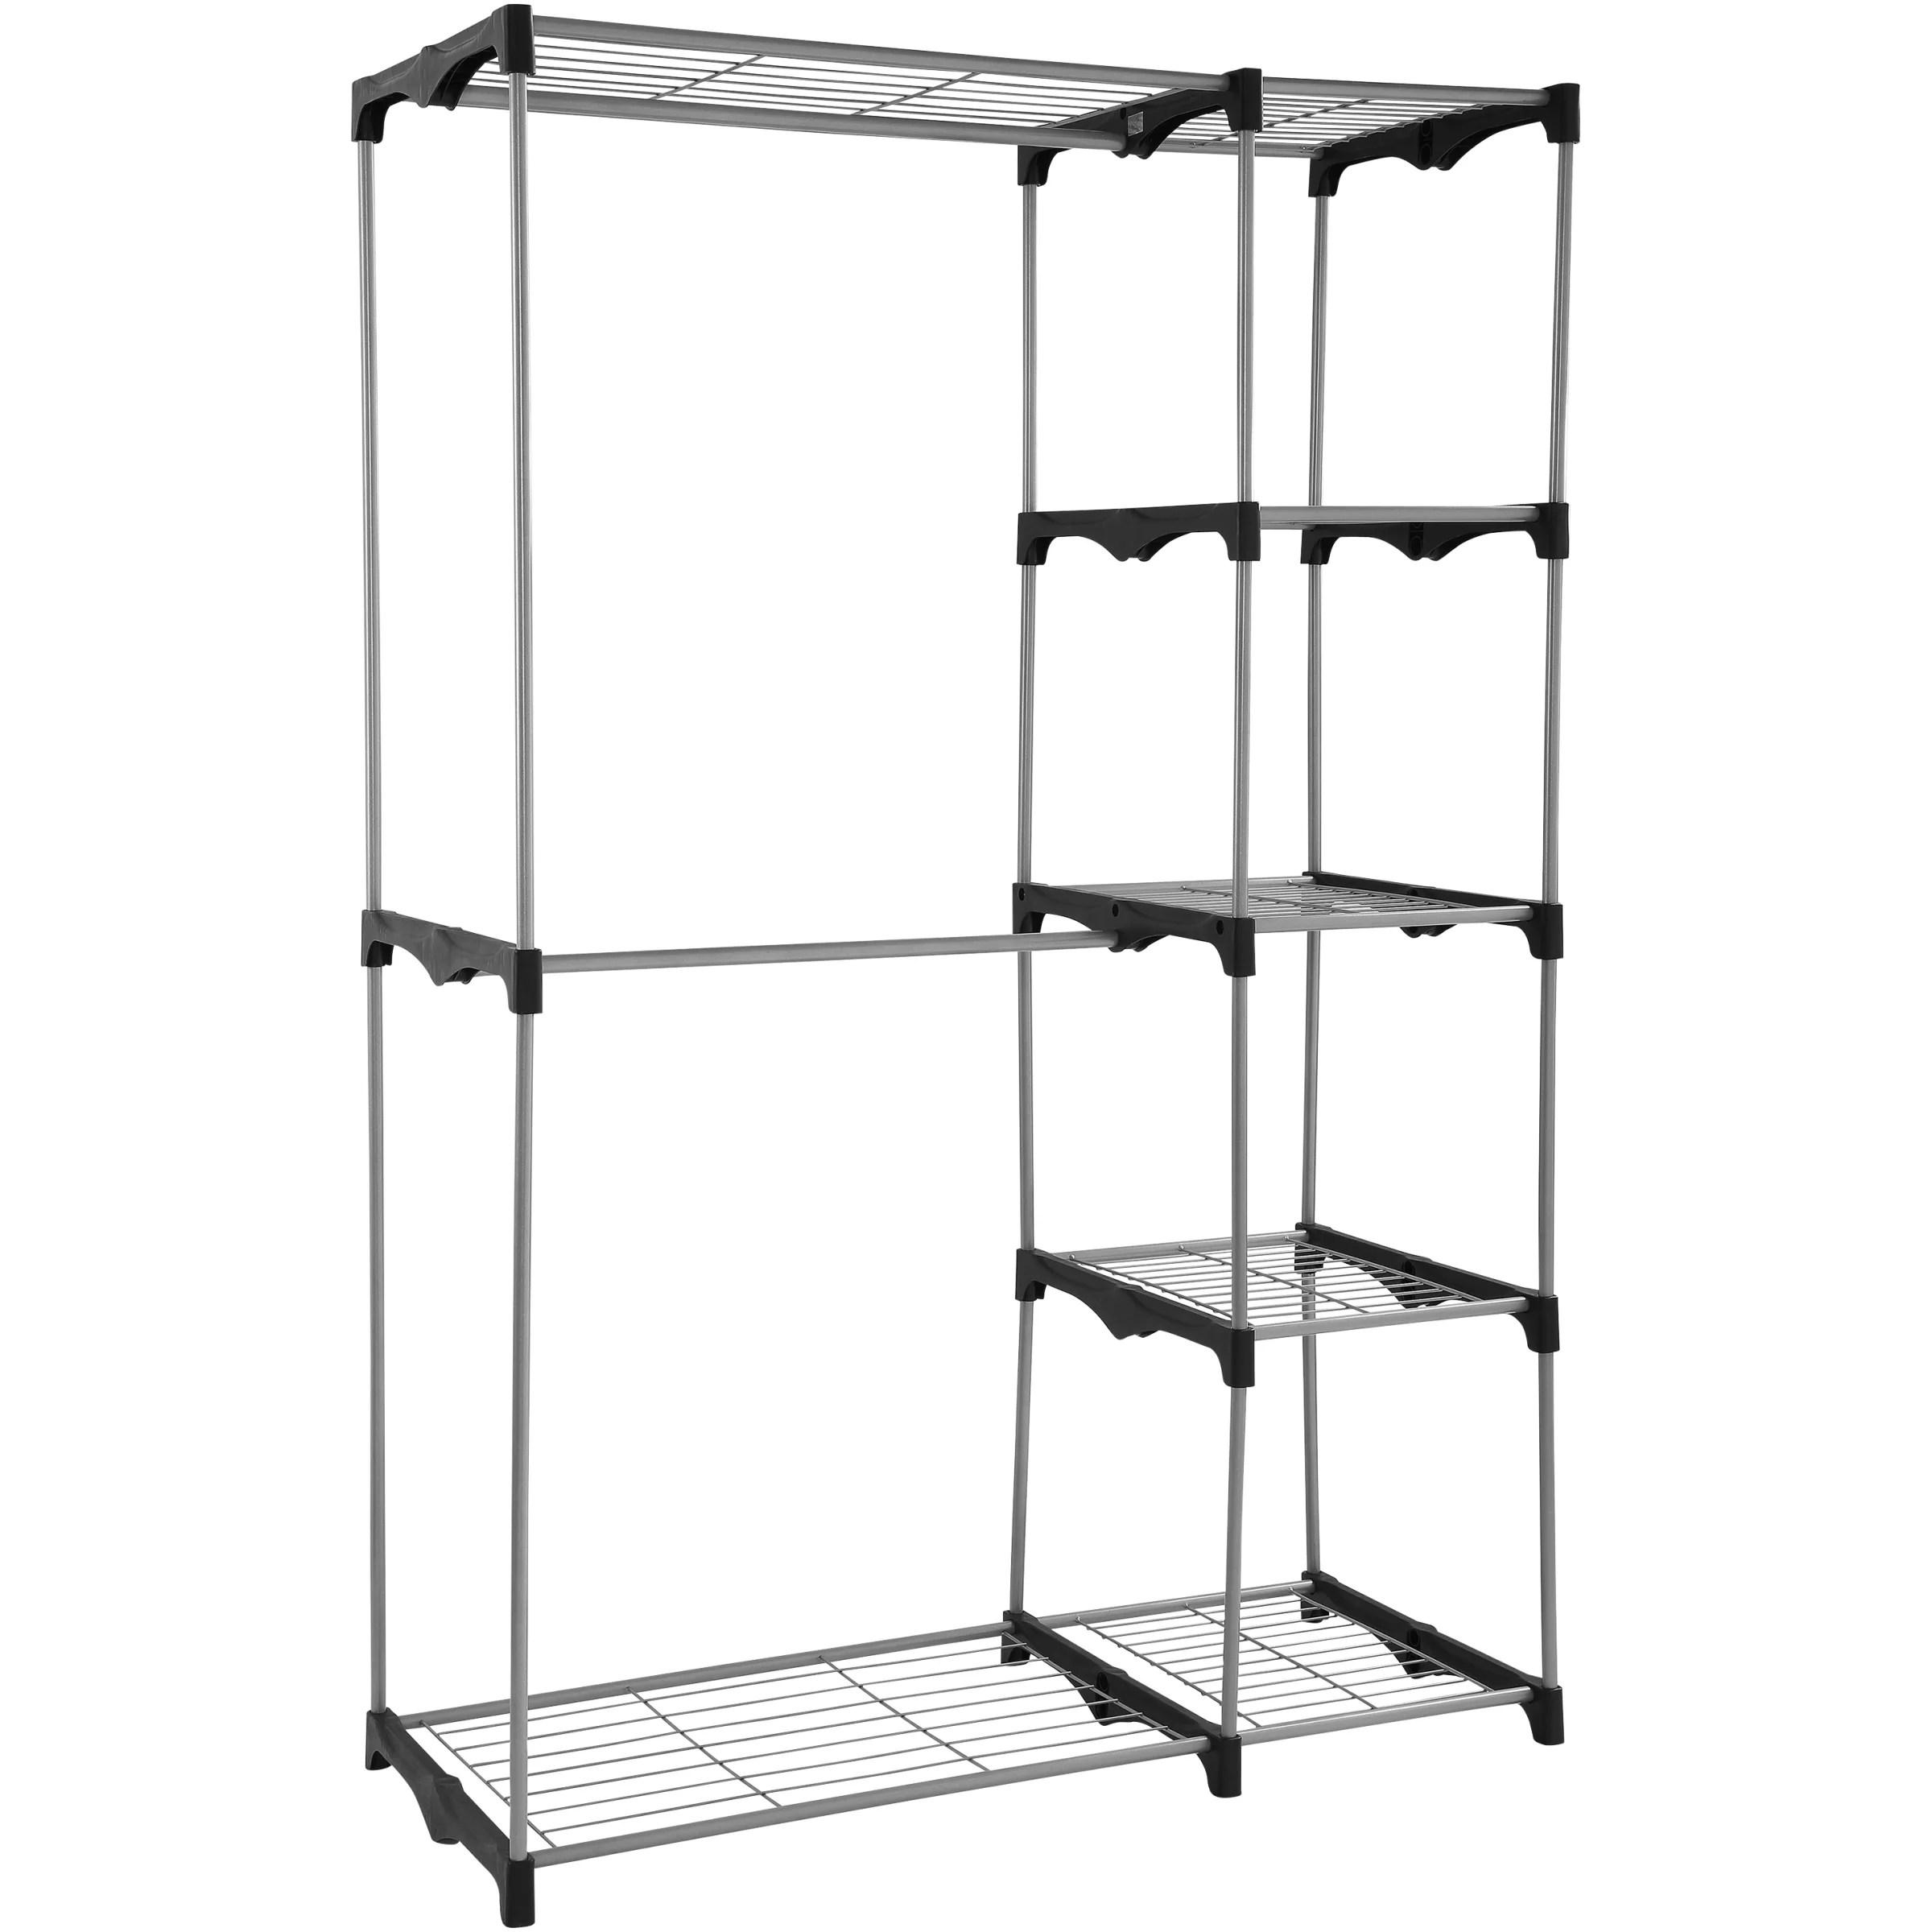 Mainstays Wire Shelf Closet Organizer 2 Tier Easy To